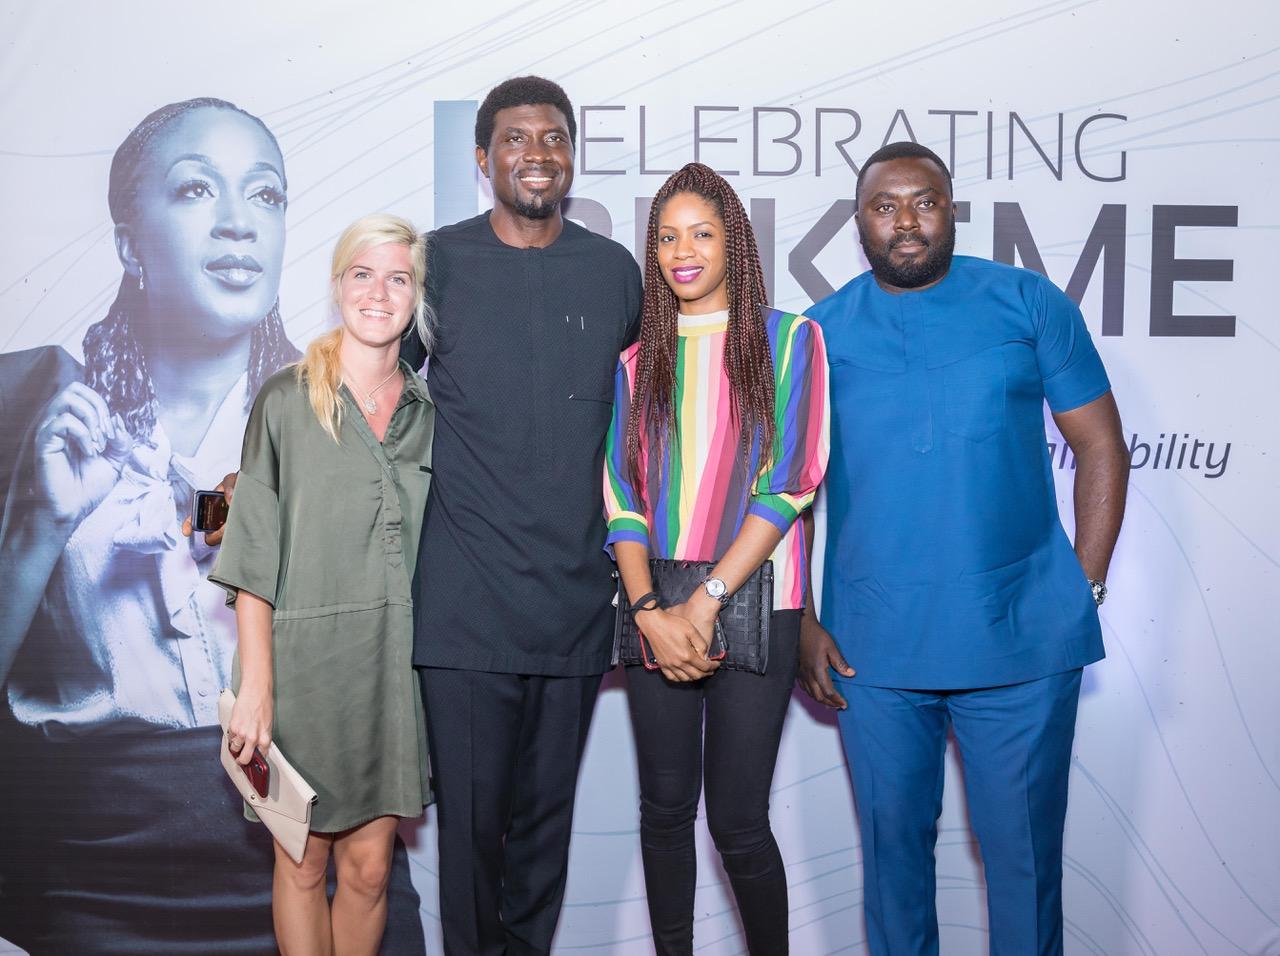 (L-R) Nues Fuster; Meka Olowola; Hadiza Adukonu and Senyo Adukonu